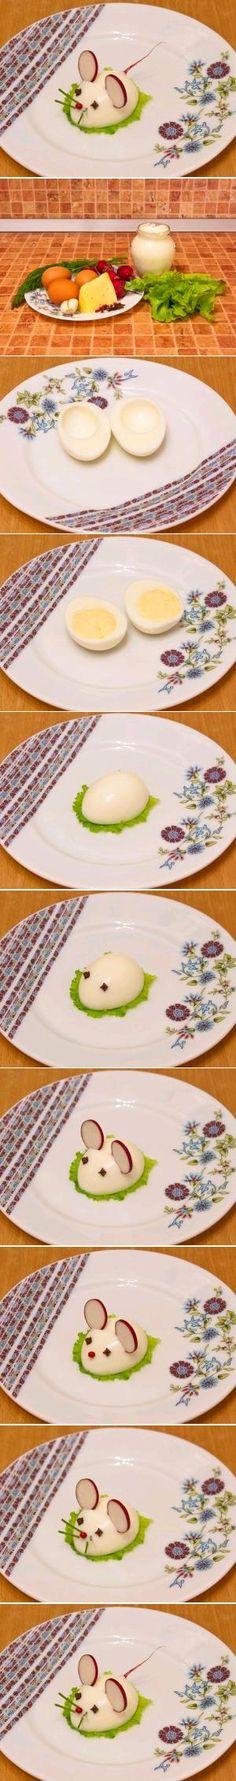 DIY Stuffed Egg Rat